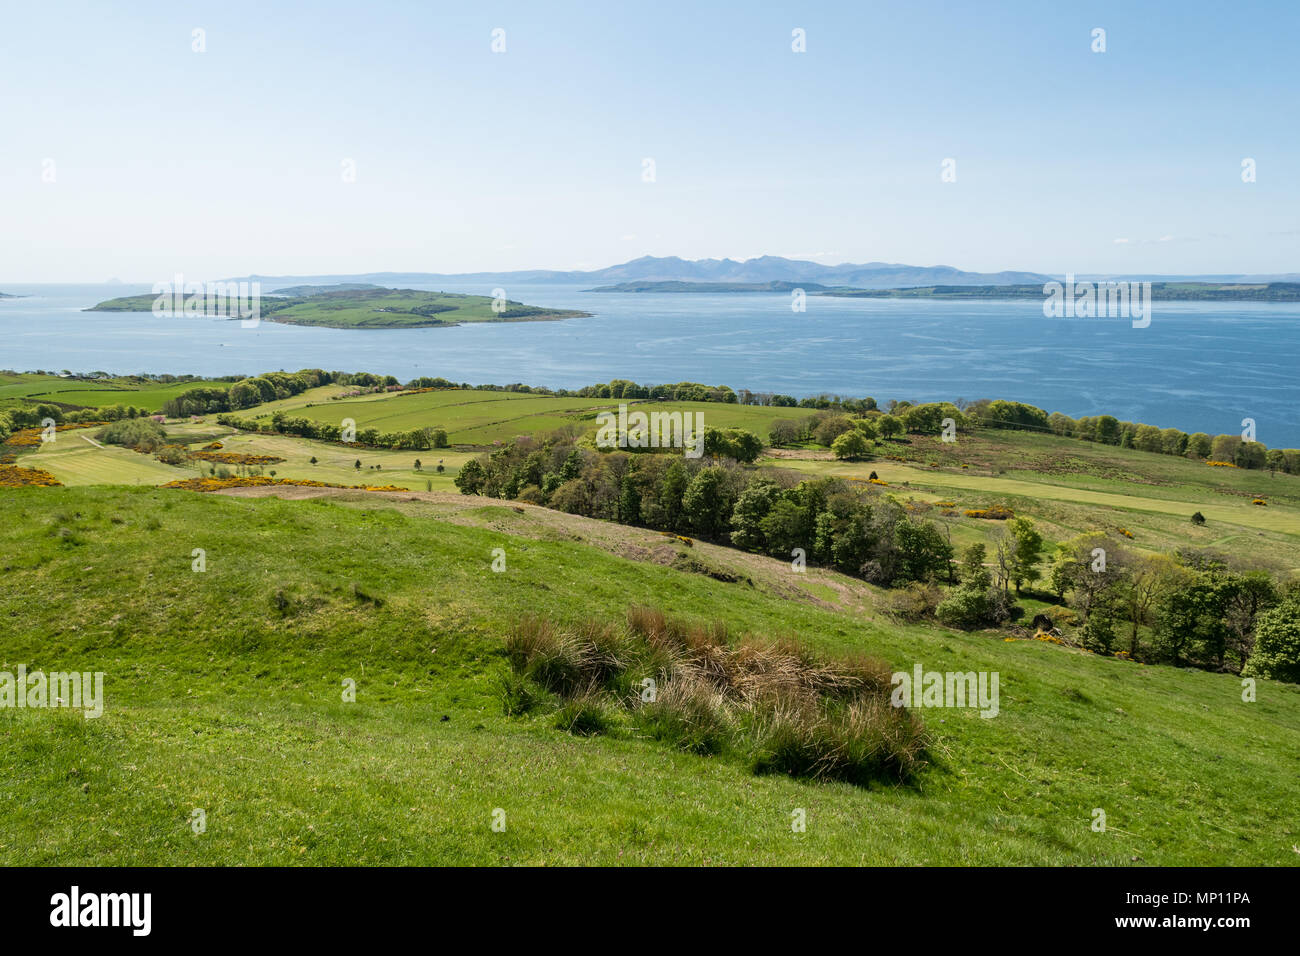 Largs Golf Club Routenburn avec de fantastiques vues sur le Firth of Clyde, North Ayrshire, Scotland, UK Photo Stock